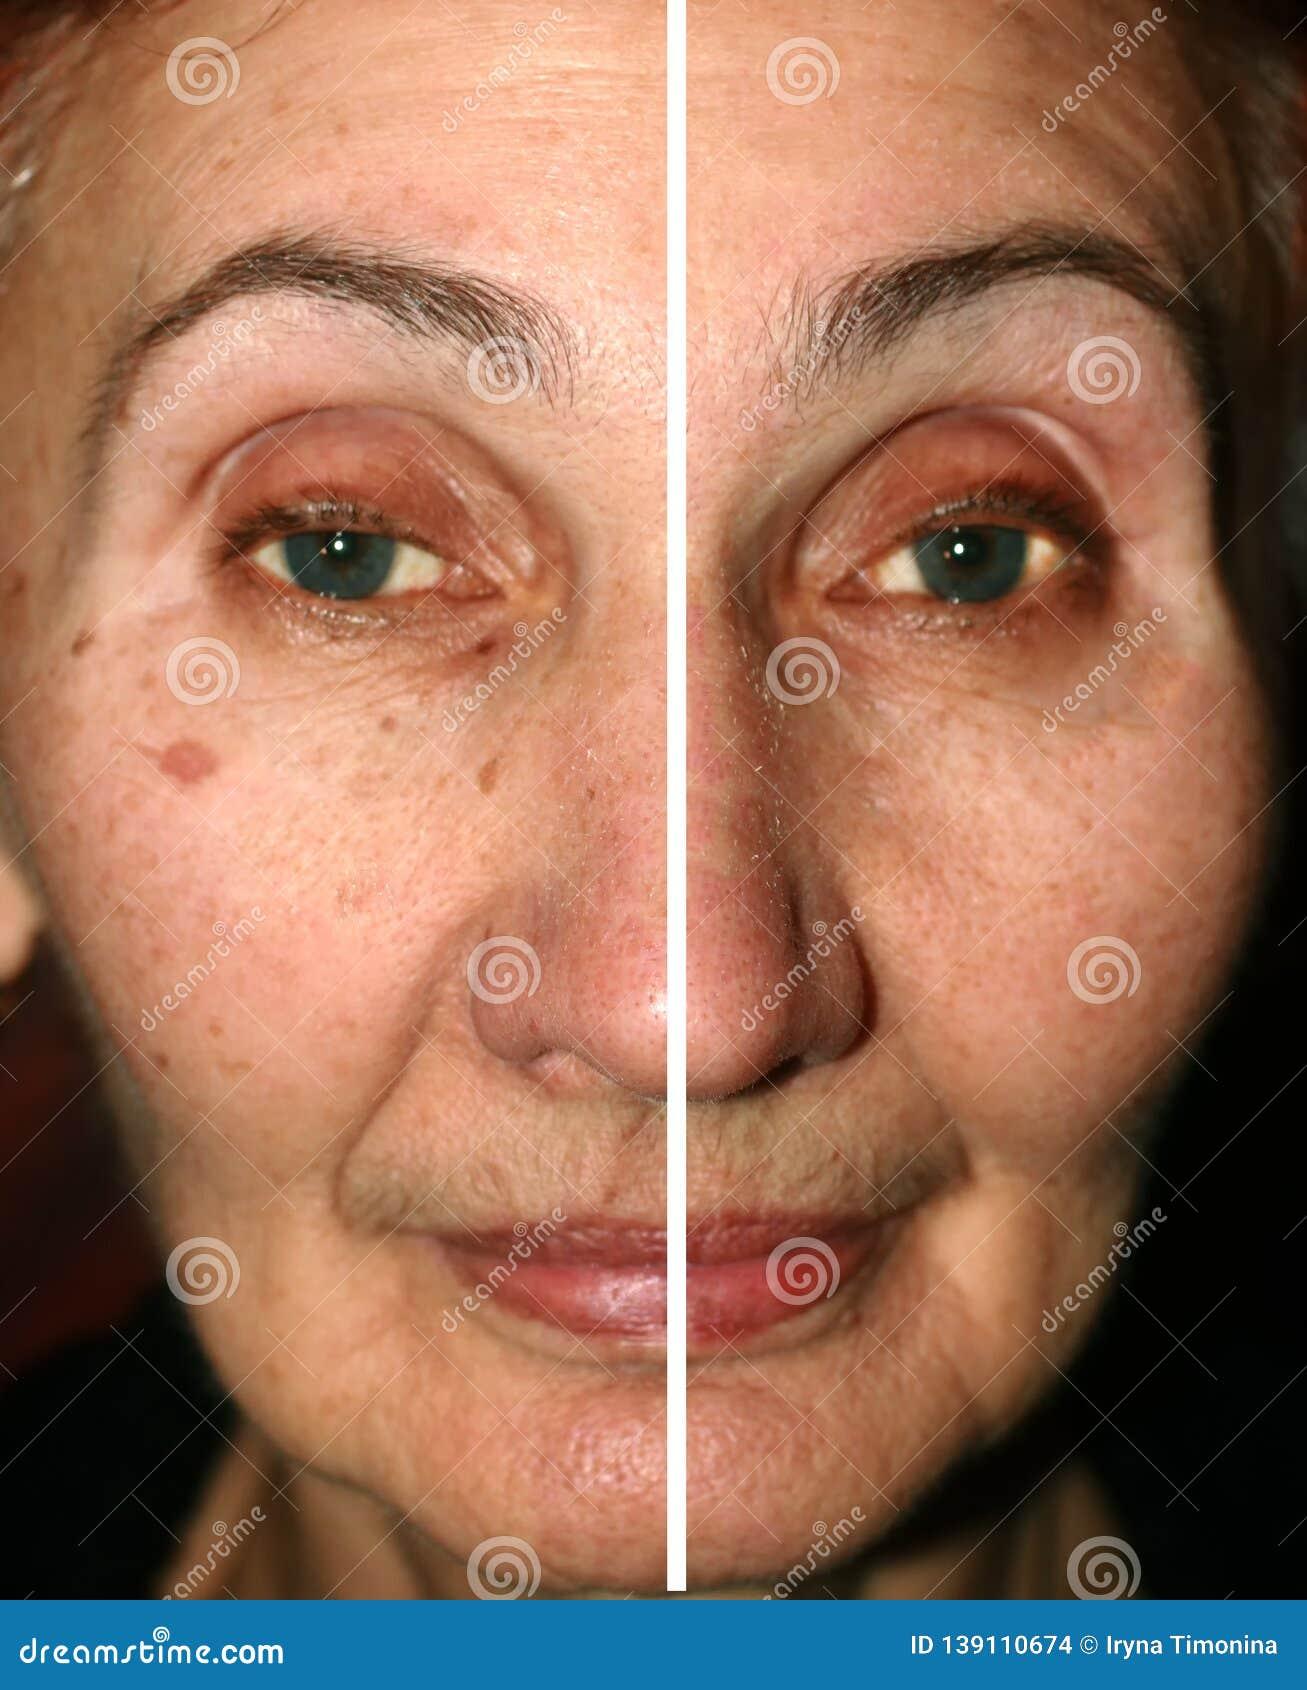 Consider, nasolabial fold facial